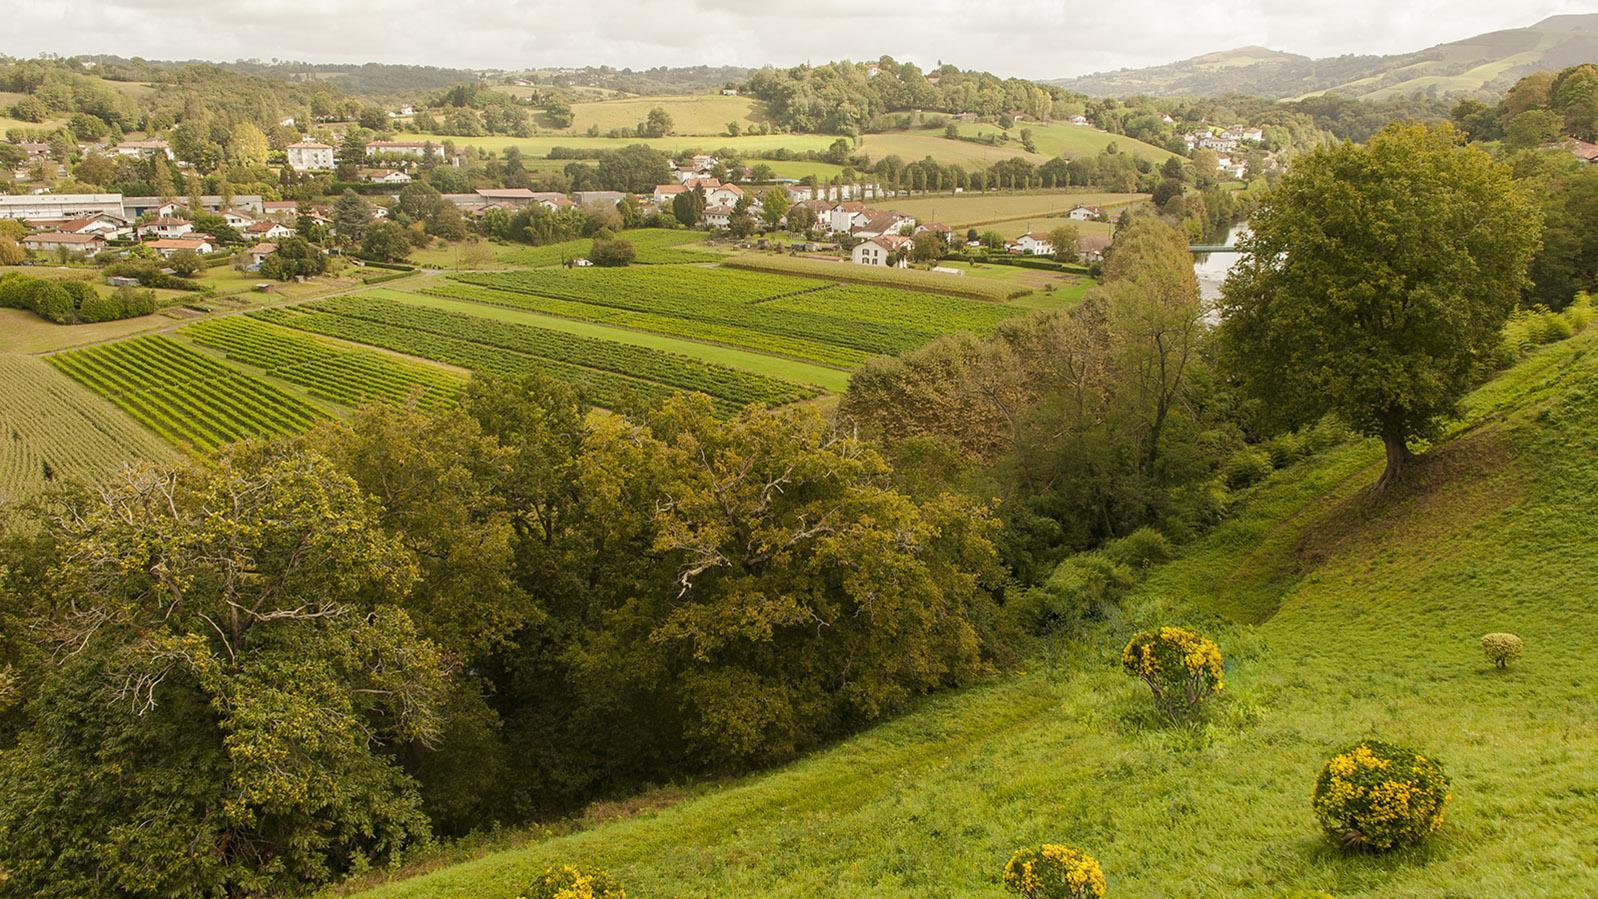 Die Piment d'Espelette-Felder von Cambo-les-Bains bewässert die Nive. Foto: Hilke Maunder